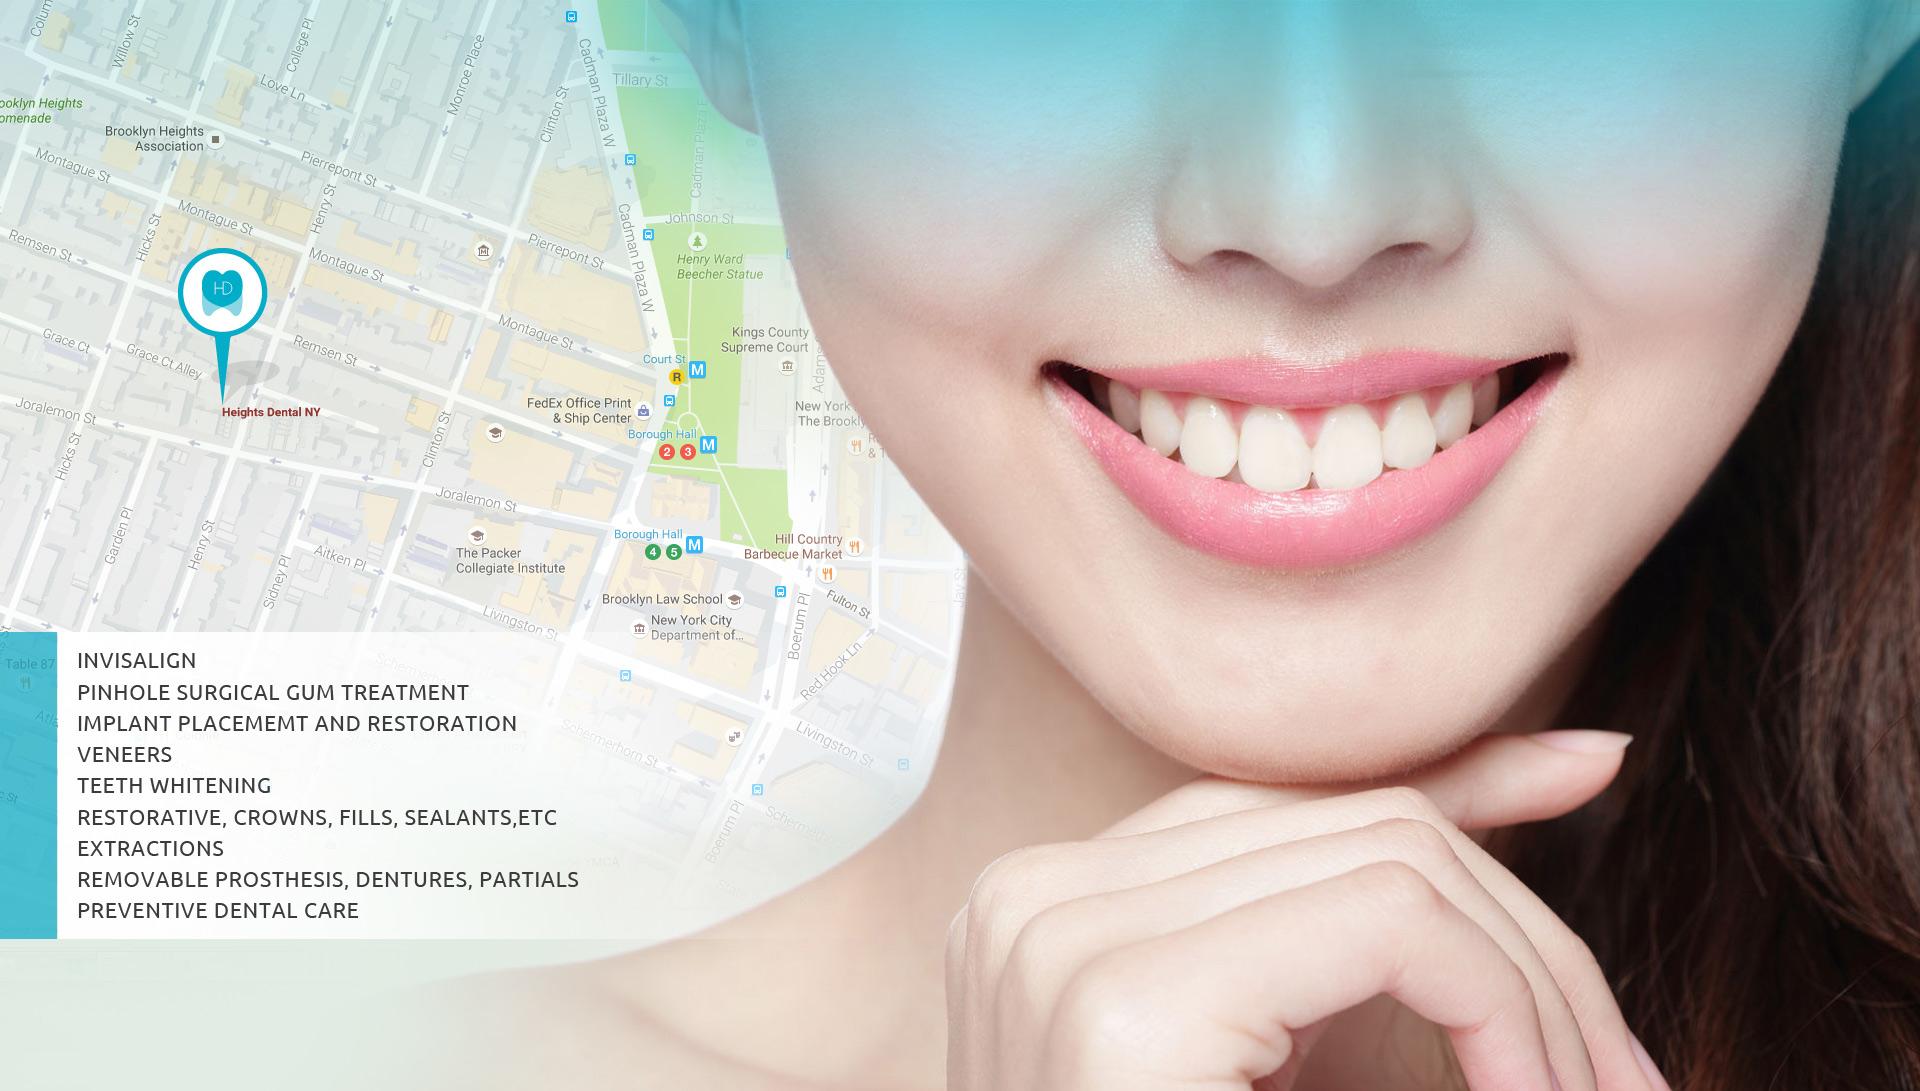 Heights Dental NY - Dr. Ewa Tracz, D.D.S. image 1